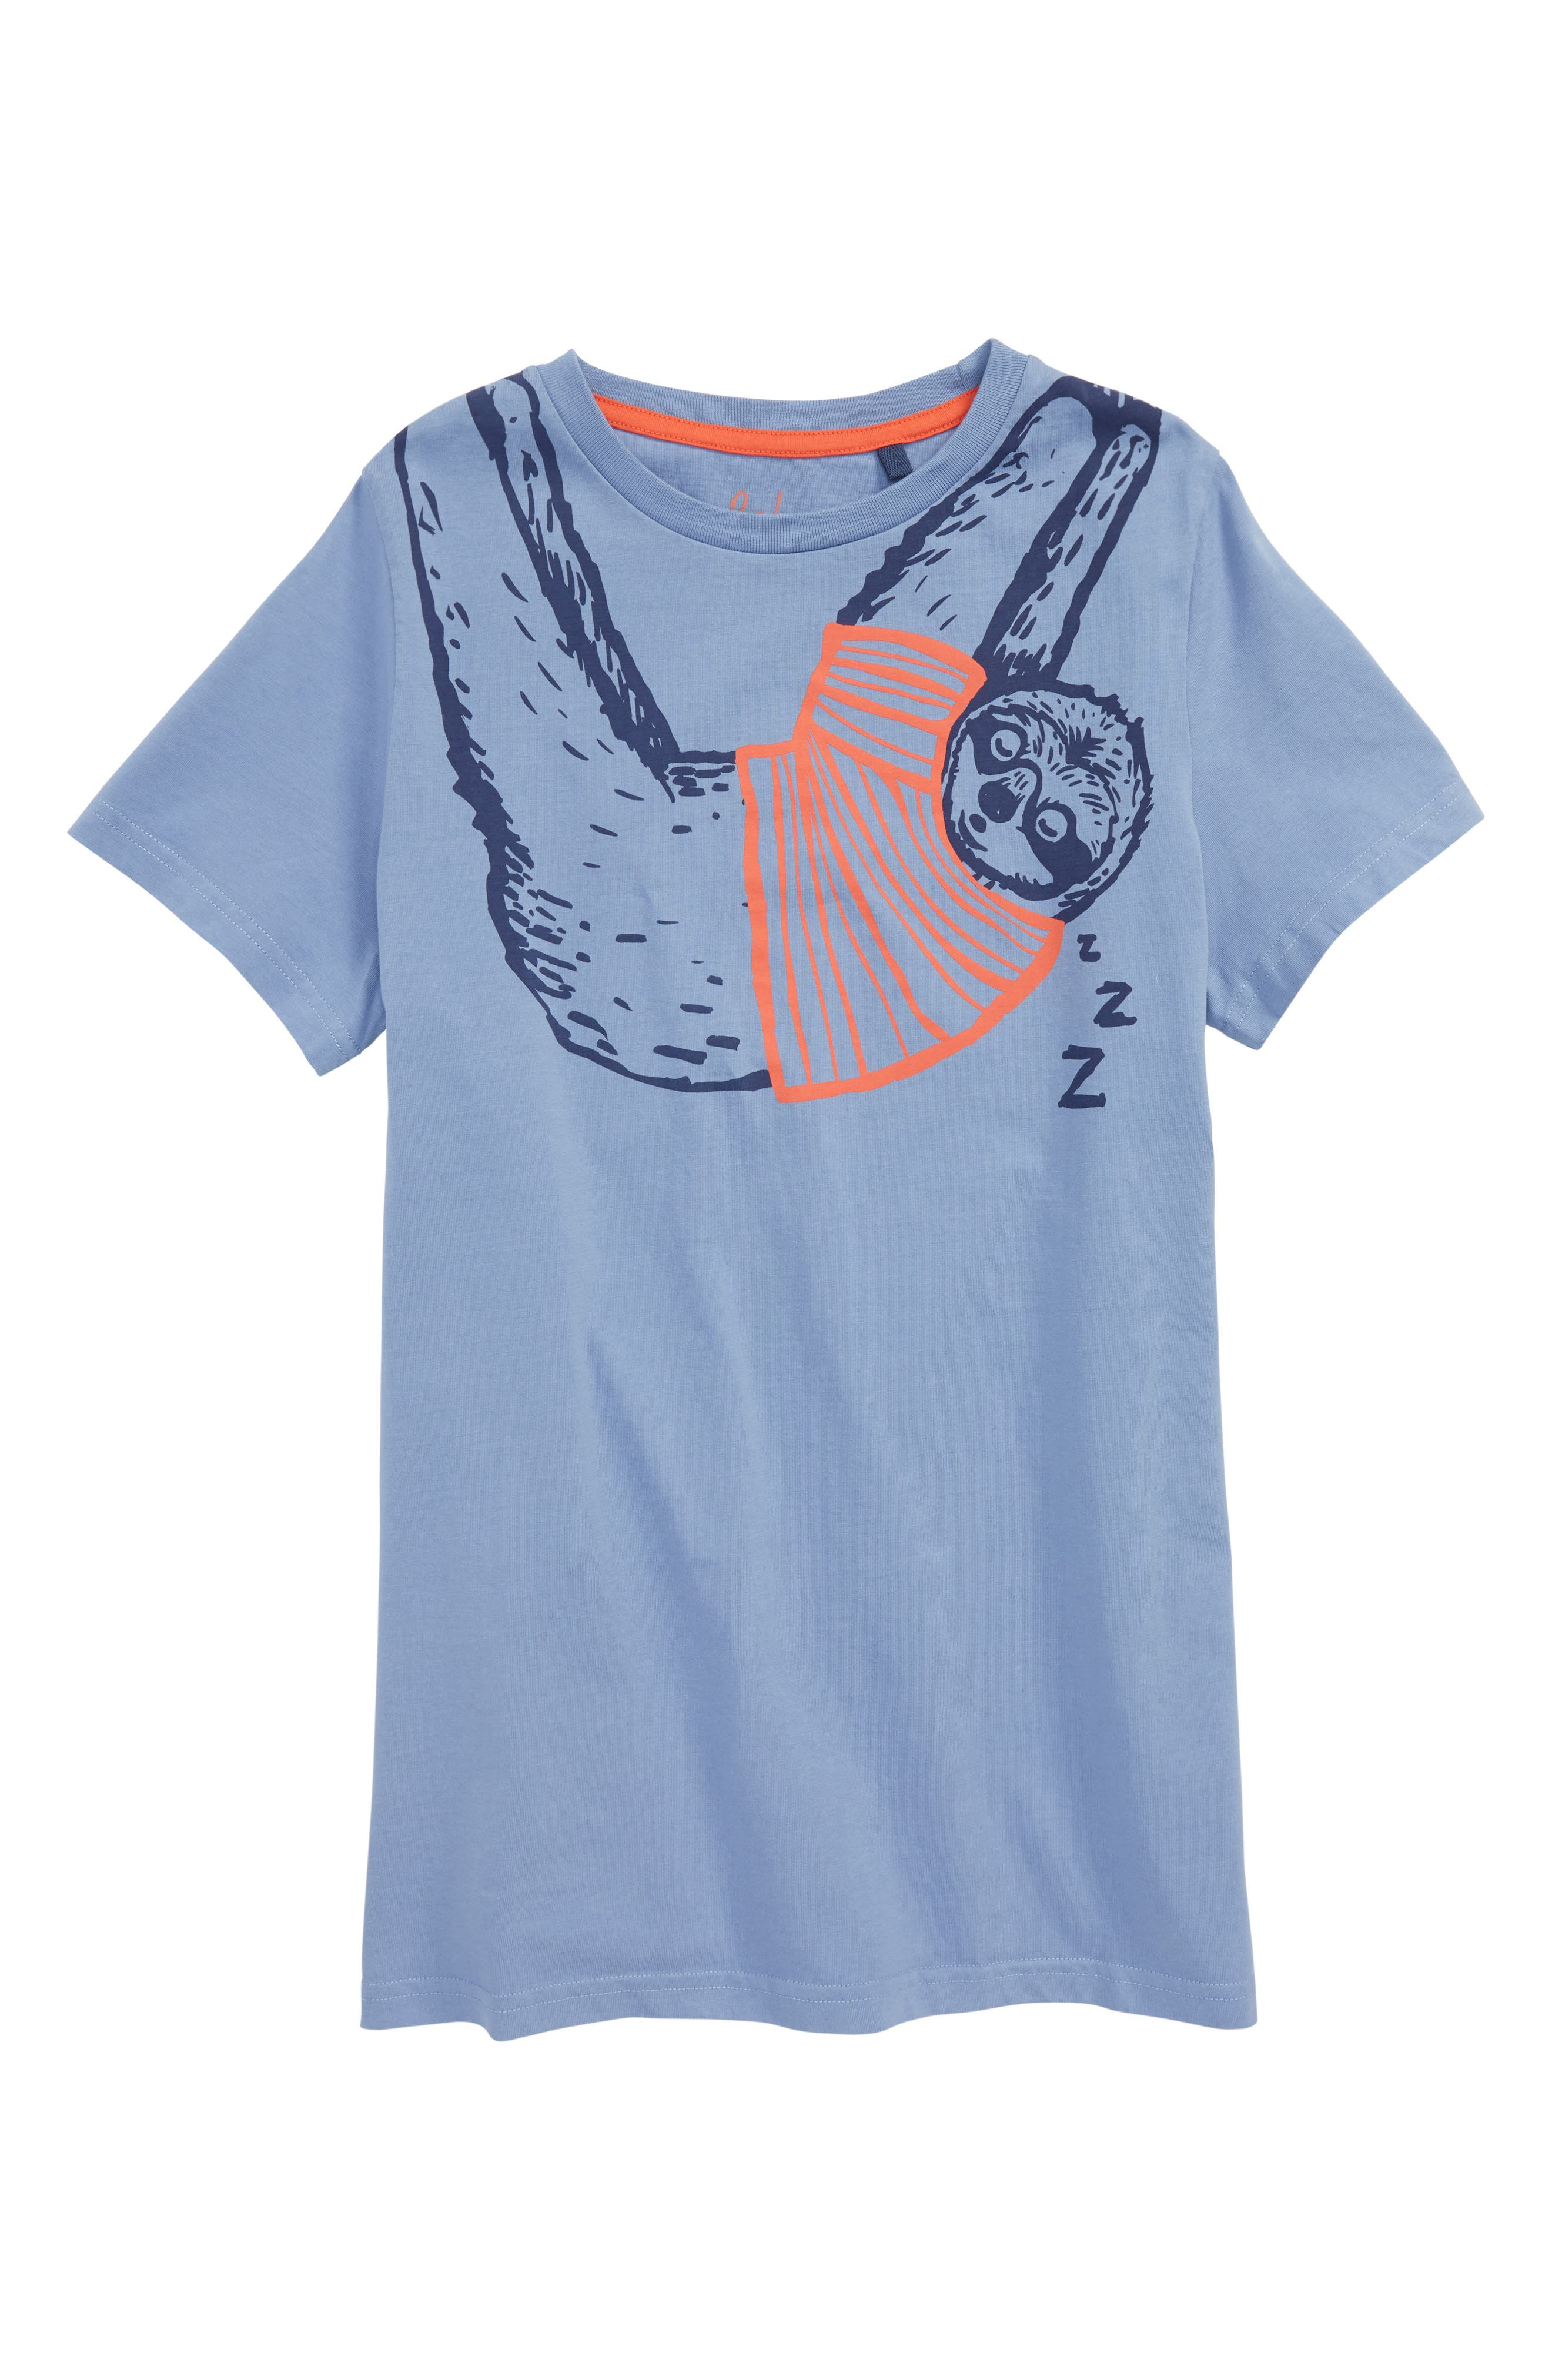 Arty Sloth T-Shirt,                             Main thumbnail 1, color,                             Hook Blue Sloth